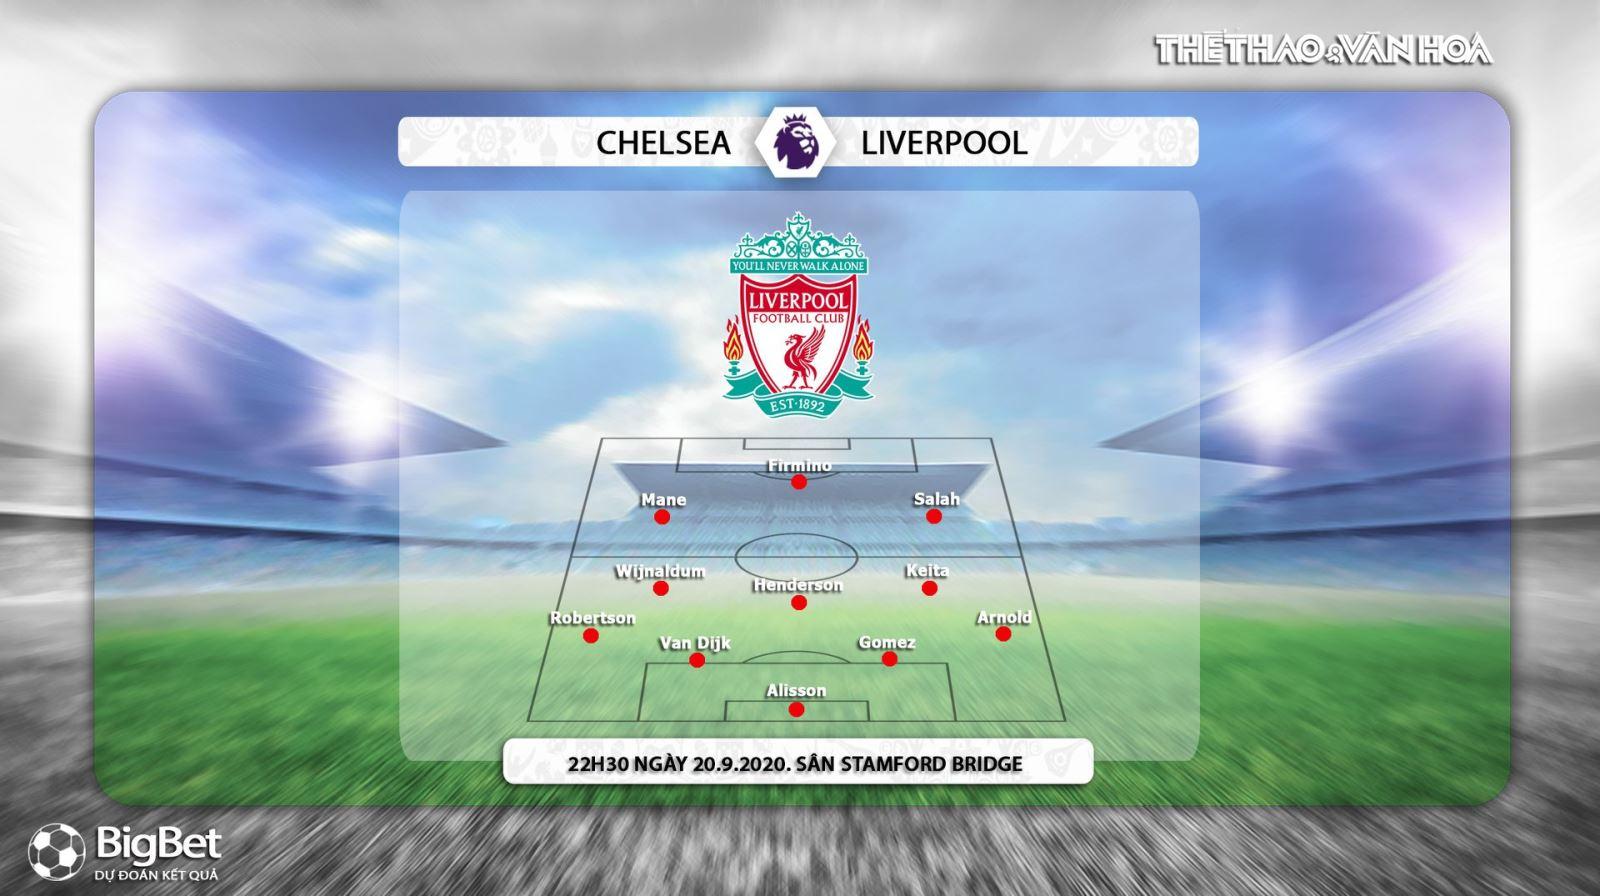 Chelsea vs Liverpool, soi kèo Chelsea vs Liverpool, nhận định Chelsea vs Liverpool, trực tiếp bóng đá, trực tiếp Chelsea vs Liverpool